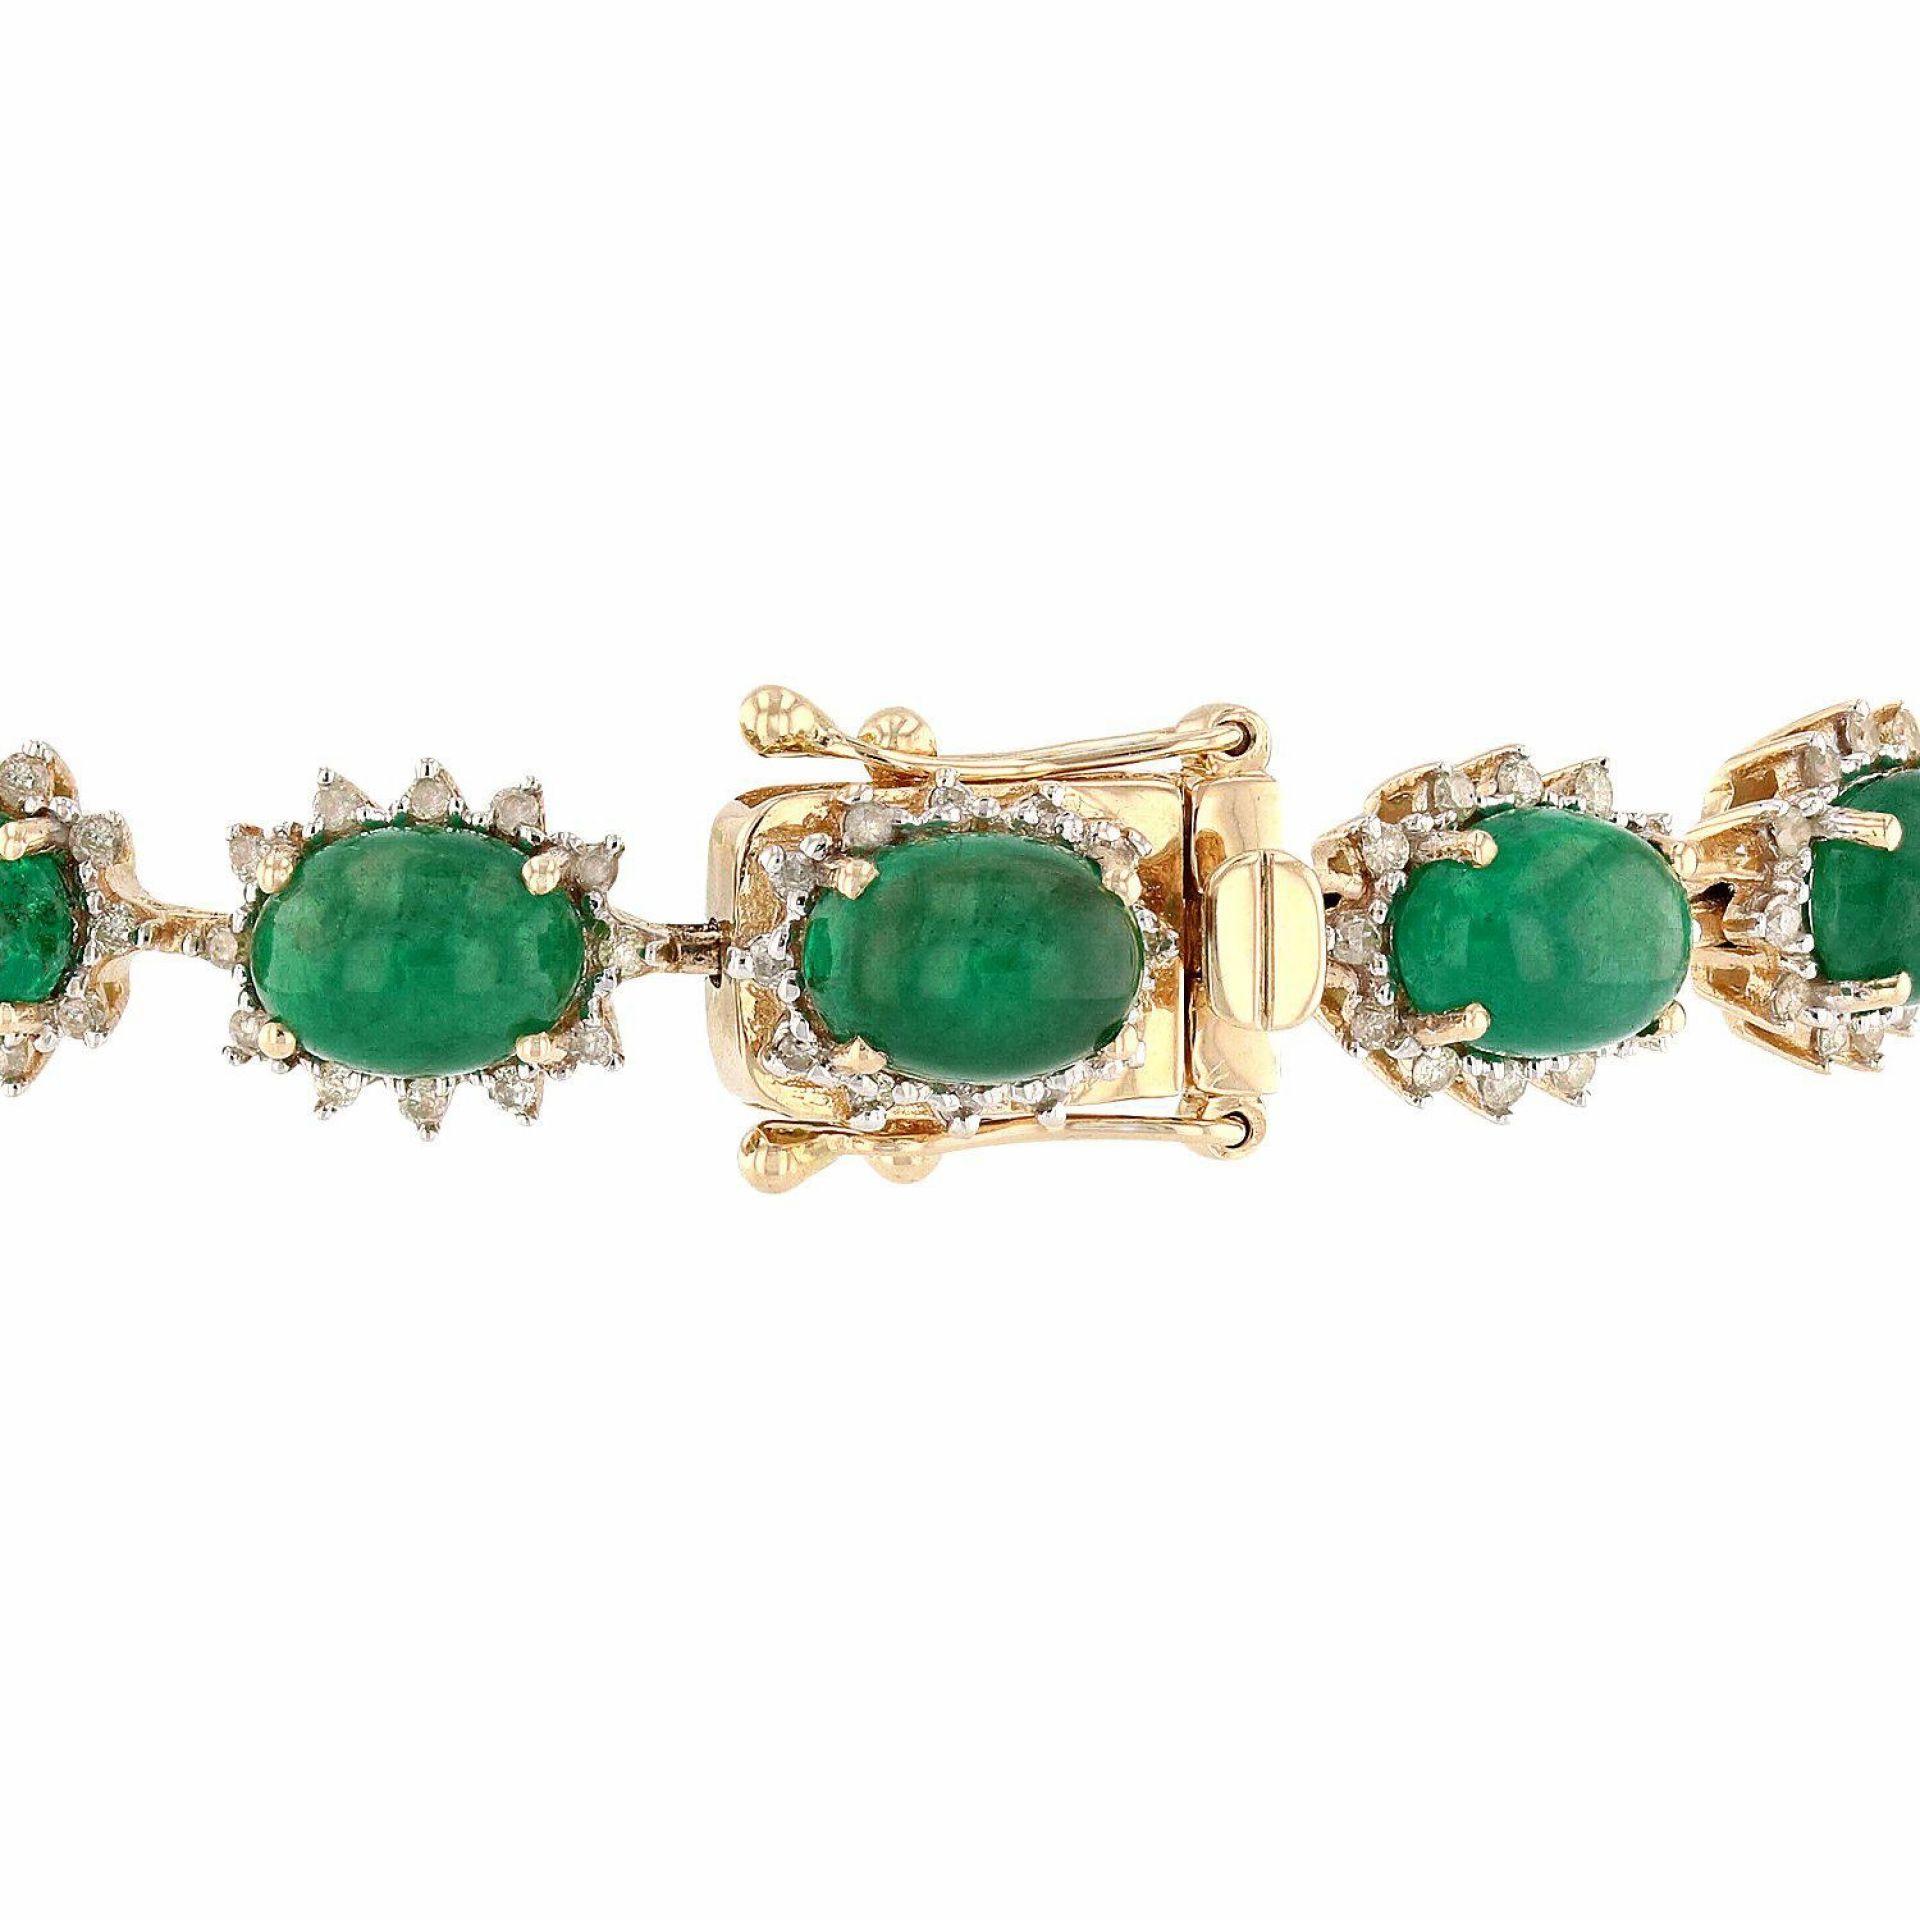 18.69ctw Emerald and 1.23ctw Diamond 14K Yellow Gold Bracelet